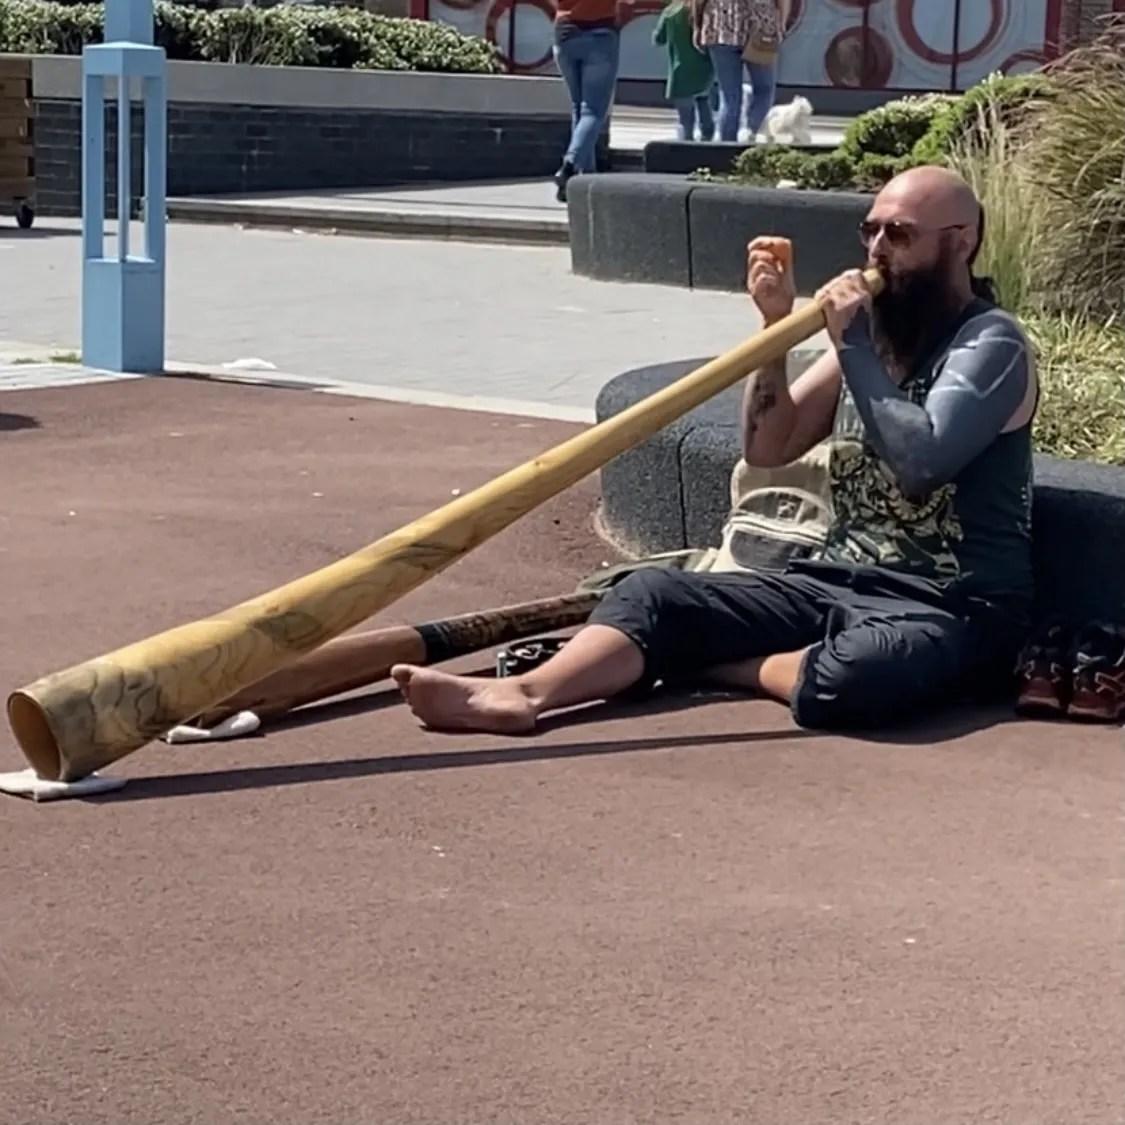 didgeridoo player Whitley Bay